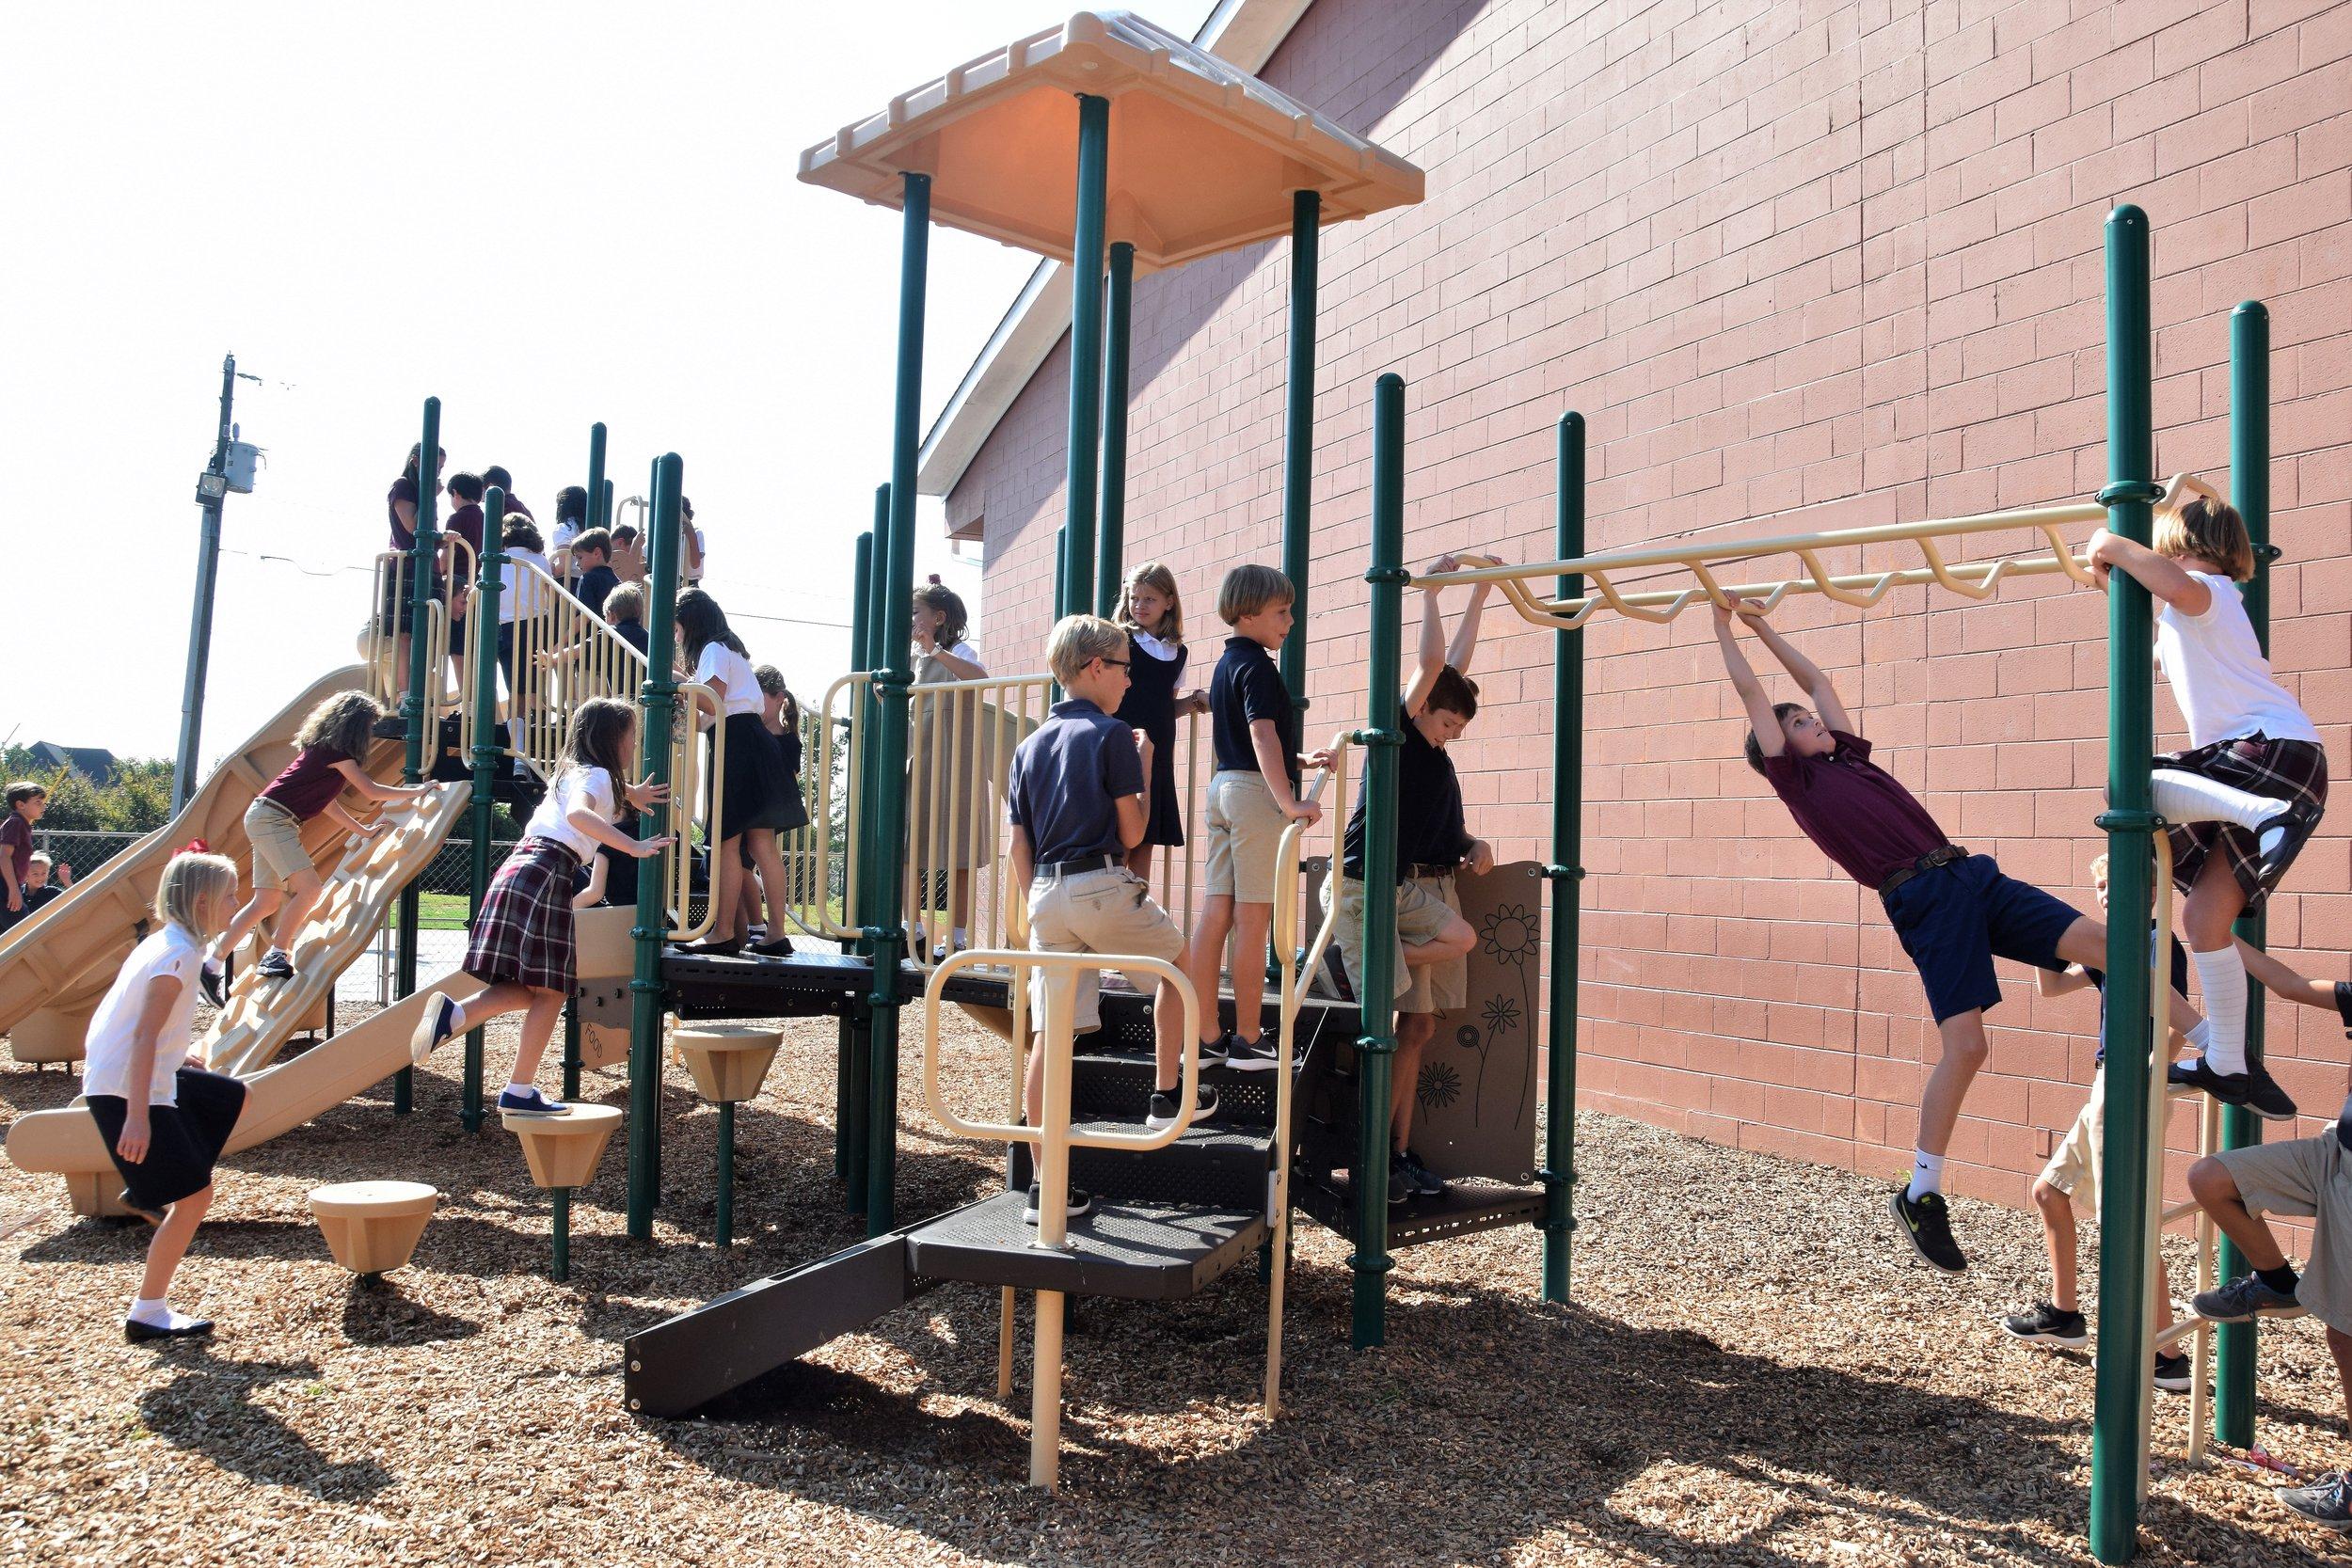 Lower School 1st Day of School 8-23-17 (33).JPG